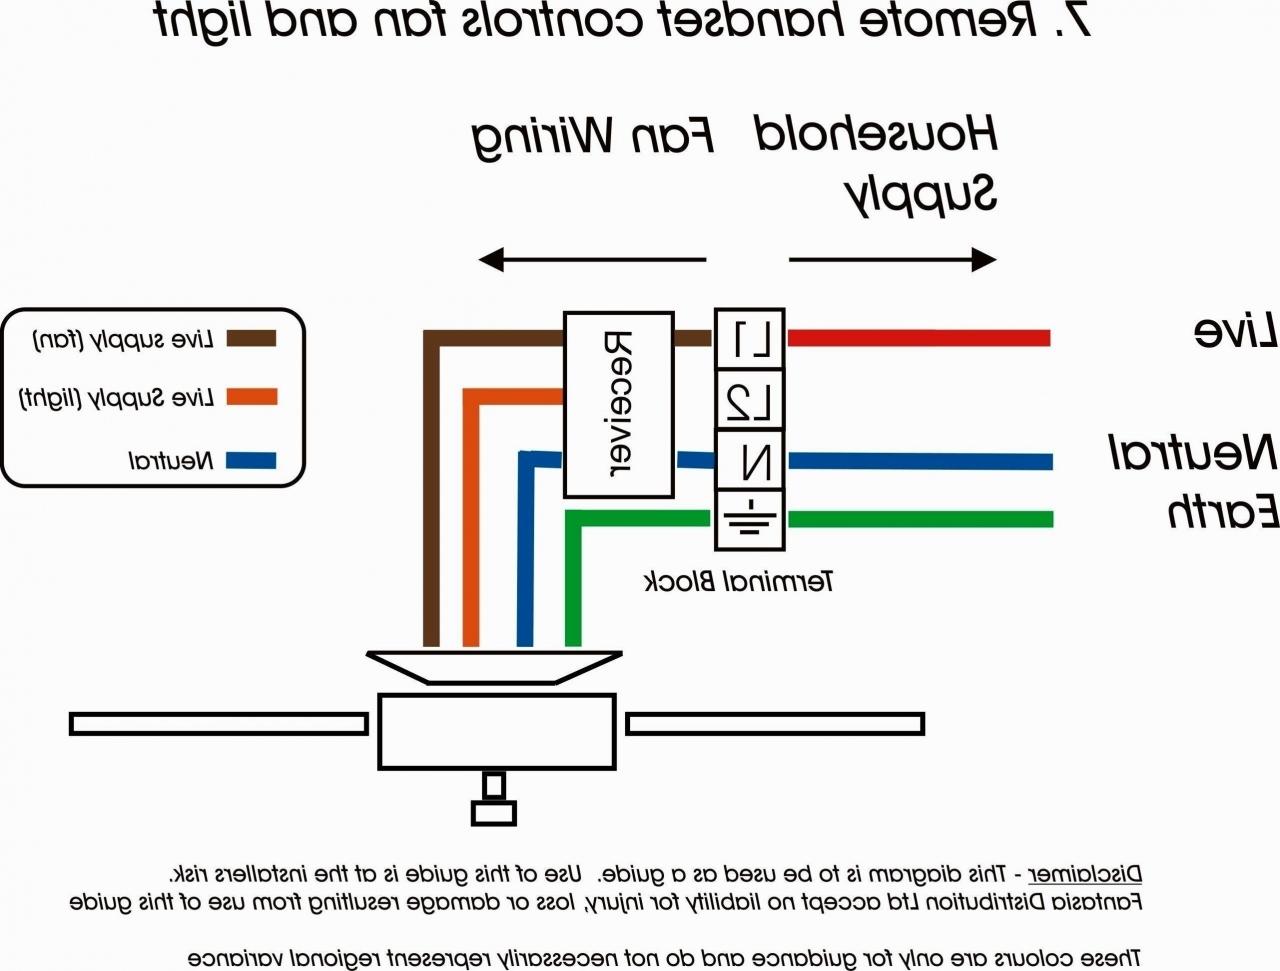 Bathroom Light Extractor Fan Wiring Diagram - Wiring Diagram Essig - Wiring A Bathroom Fan And Light Diagram